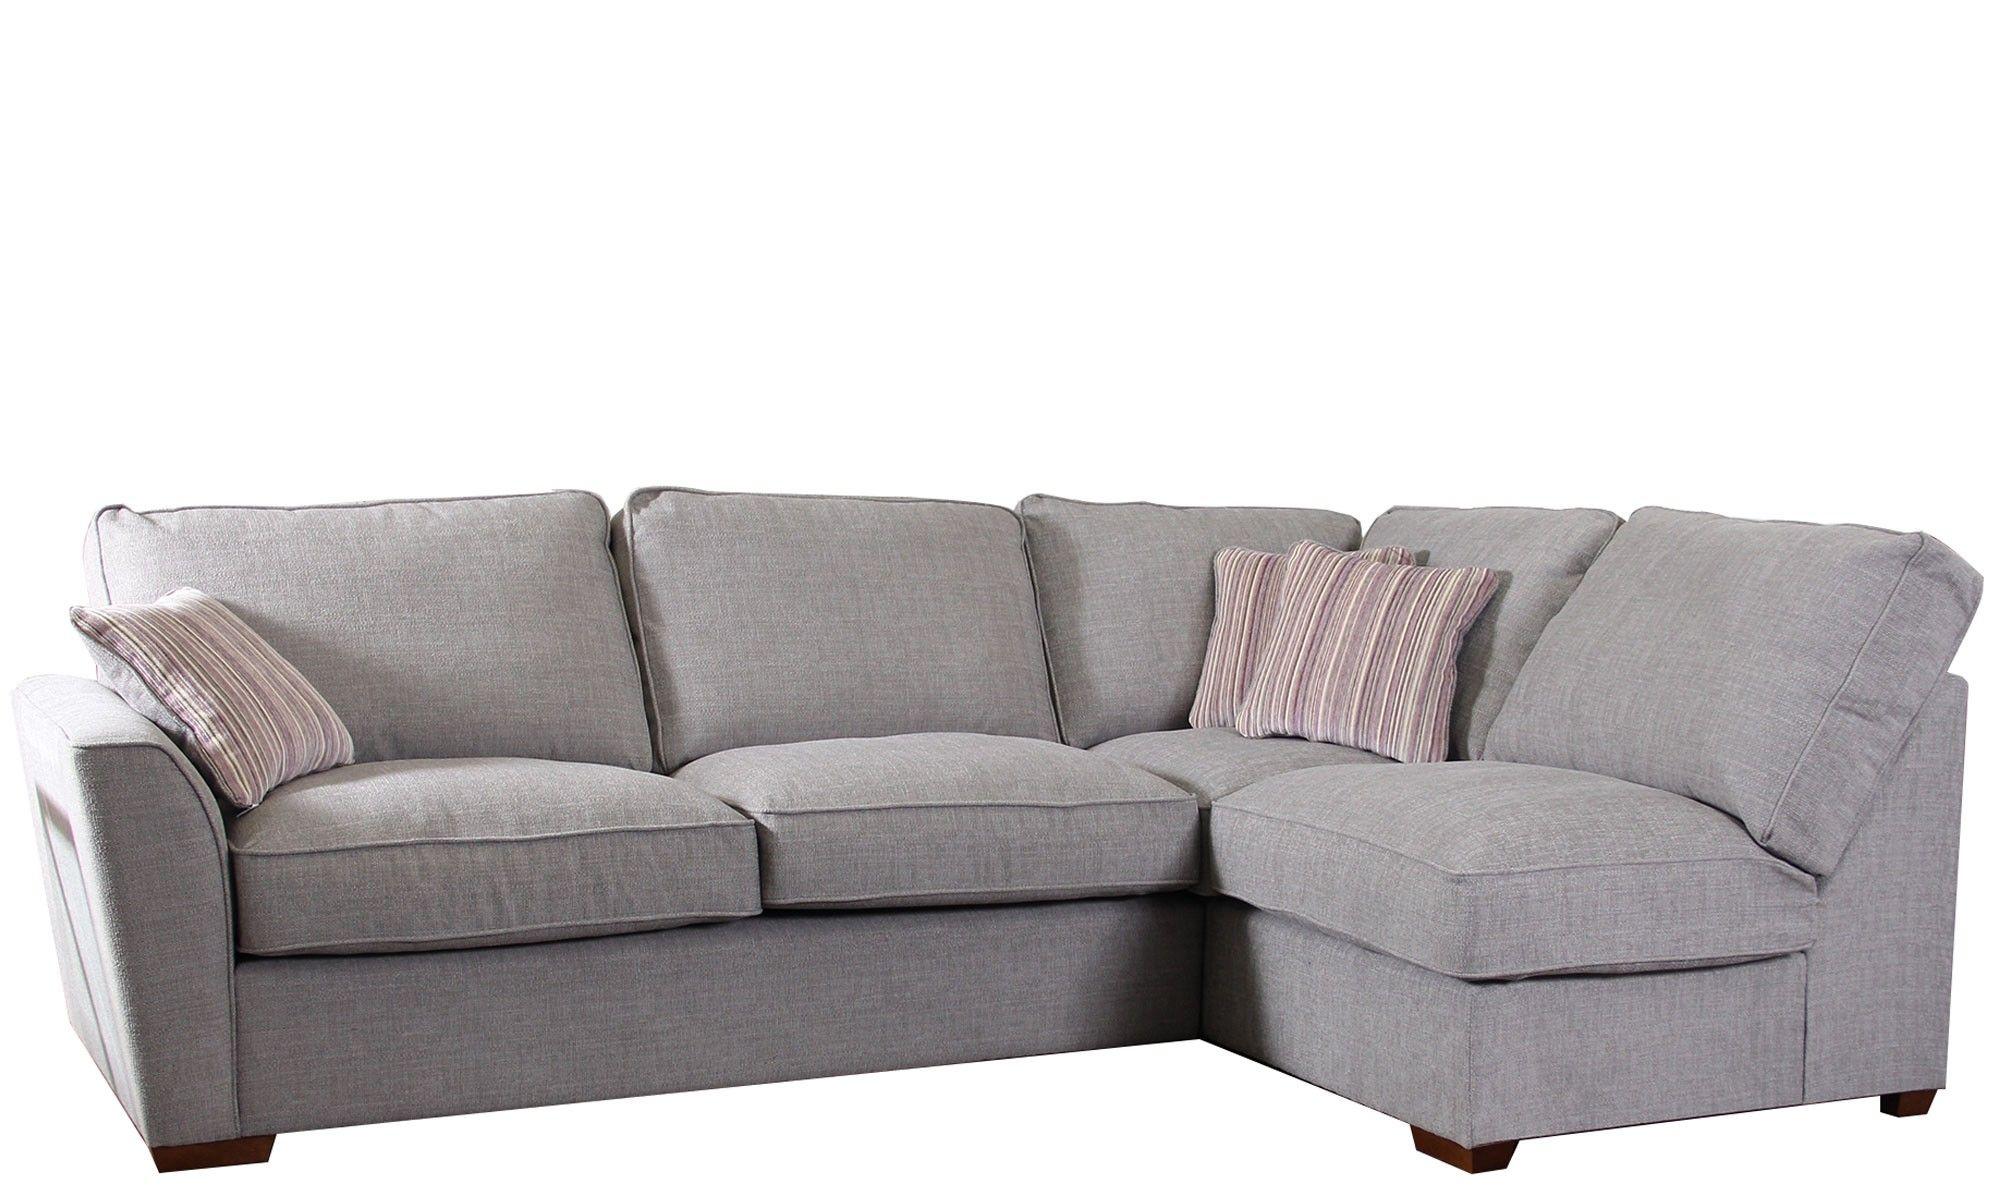 Miraculous The Memphis Left Hand Corner Sofa Bed Is A Stylish Creativecarmelina Interior Chair Design Creativecarmelinacom